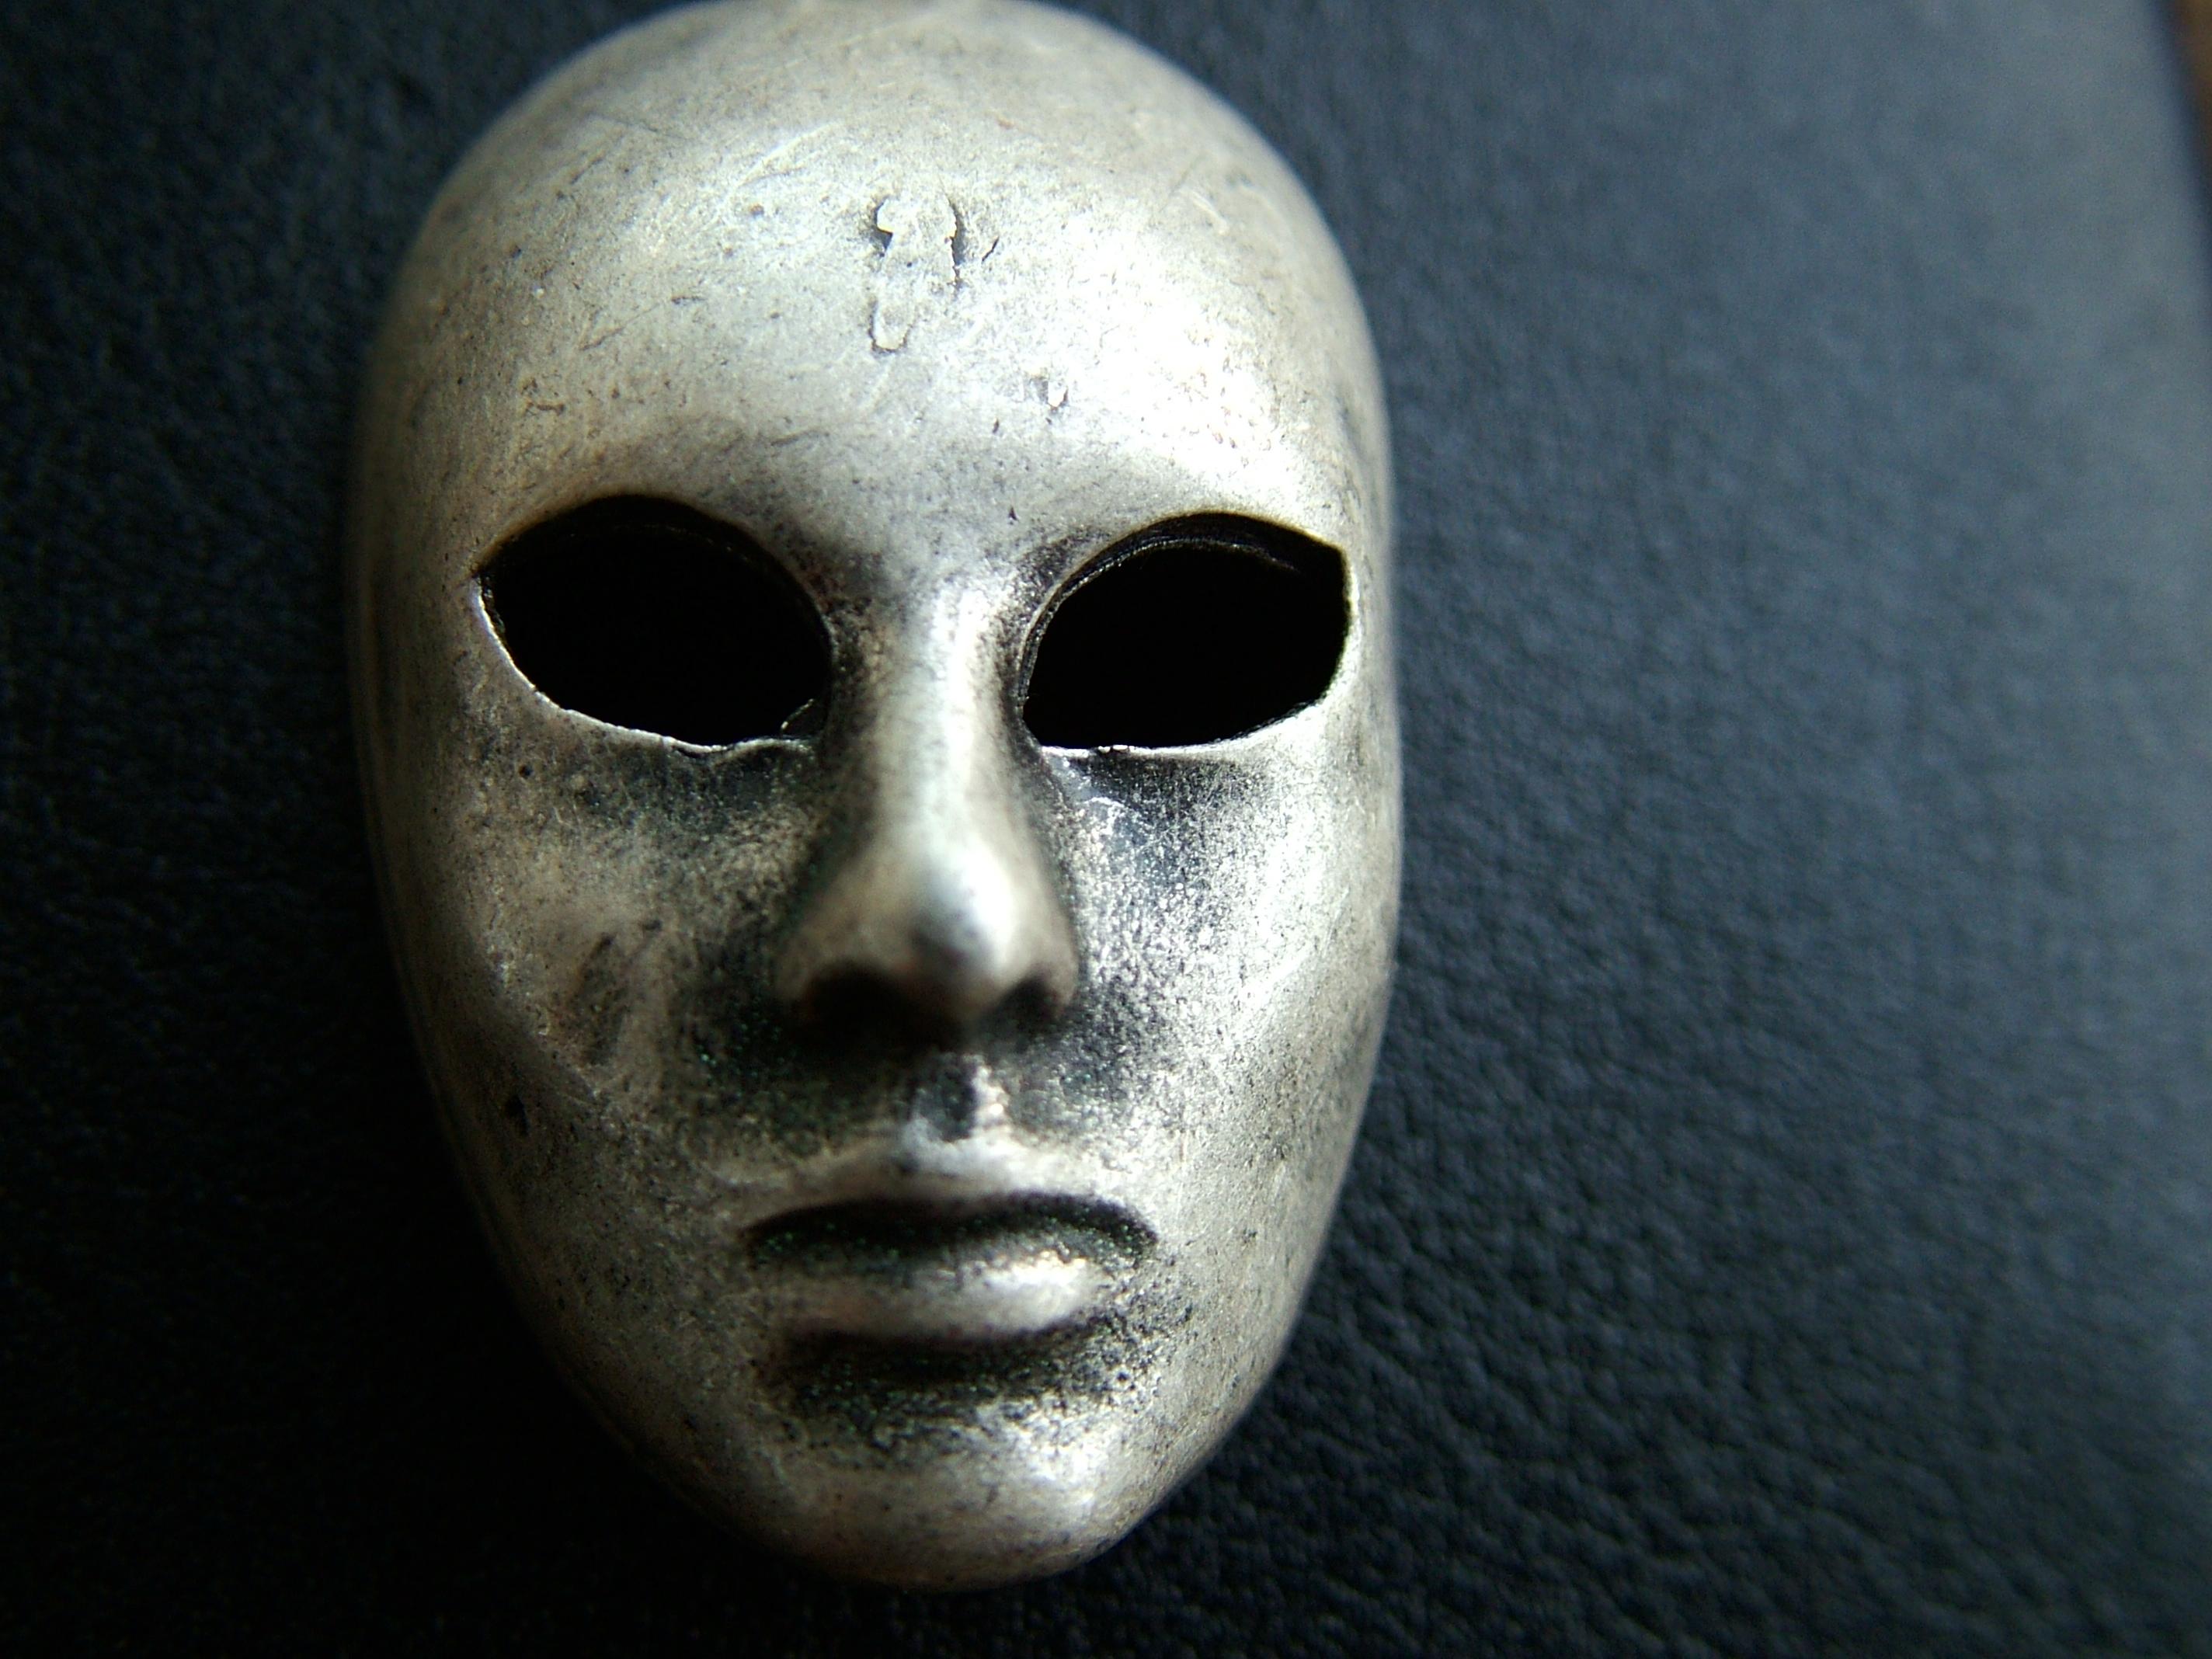 Iron mask sociopath